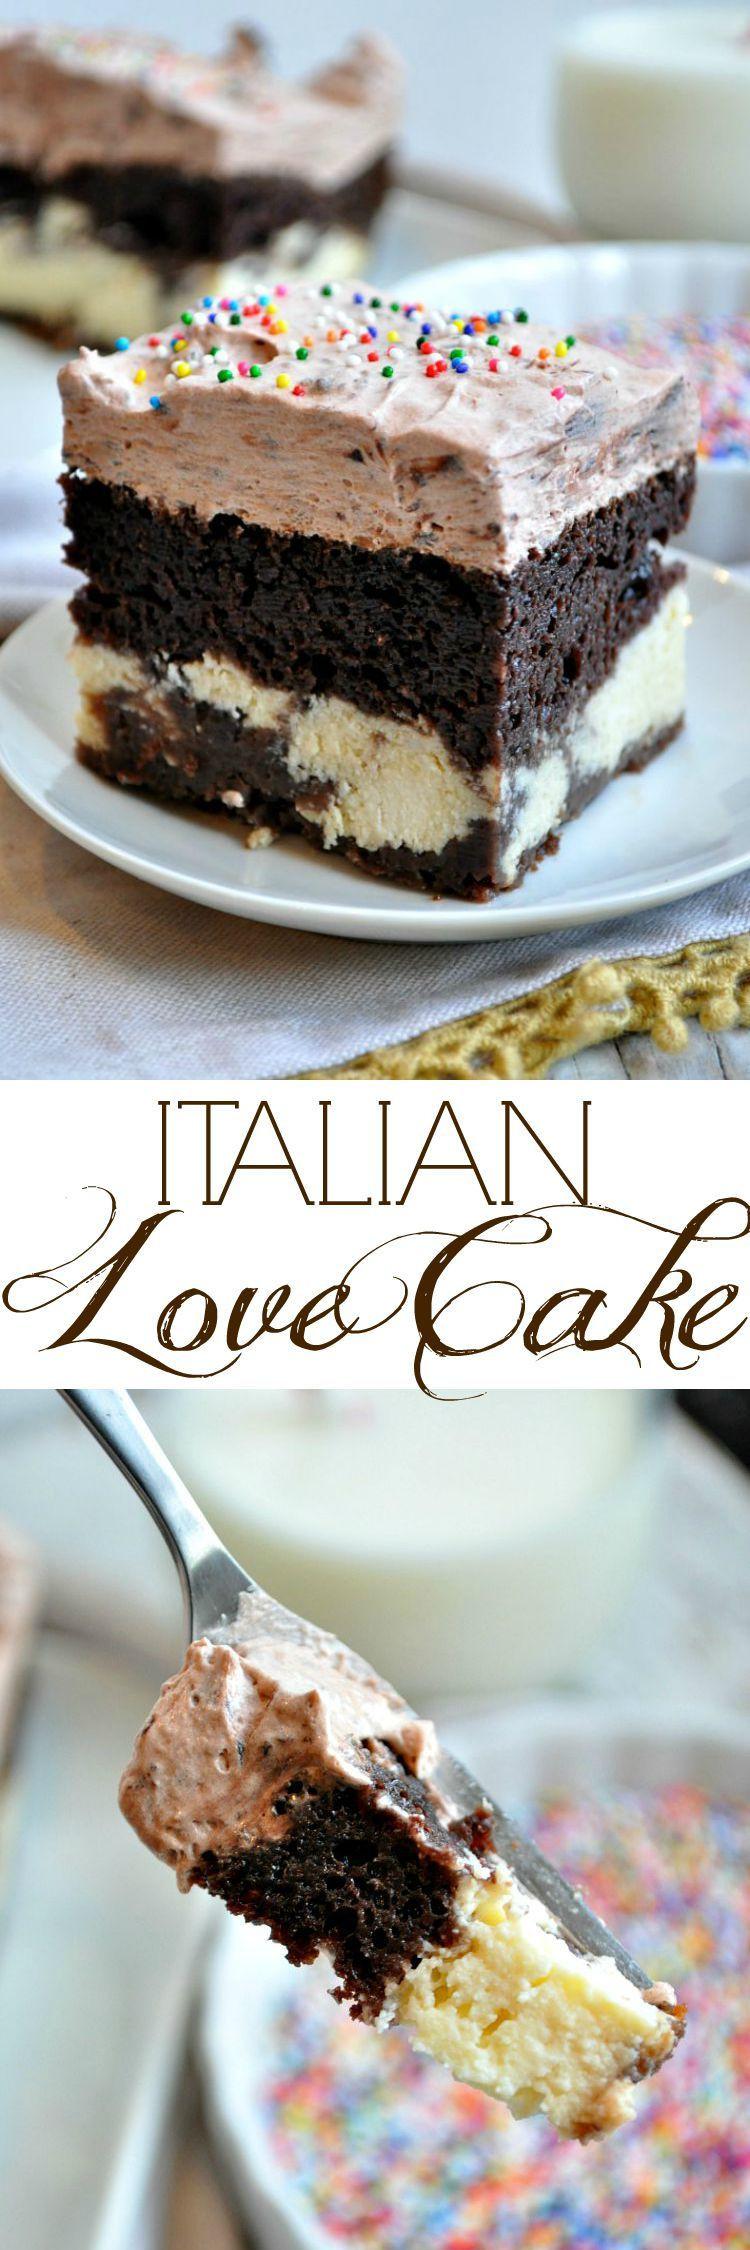 Chocolate Desserts Easy  Easy Chocolate Italian Love Cake Recipe